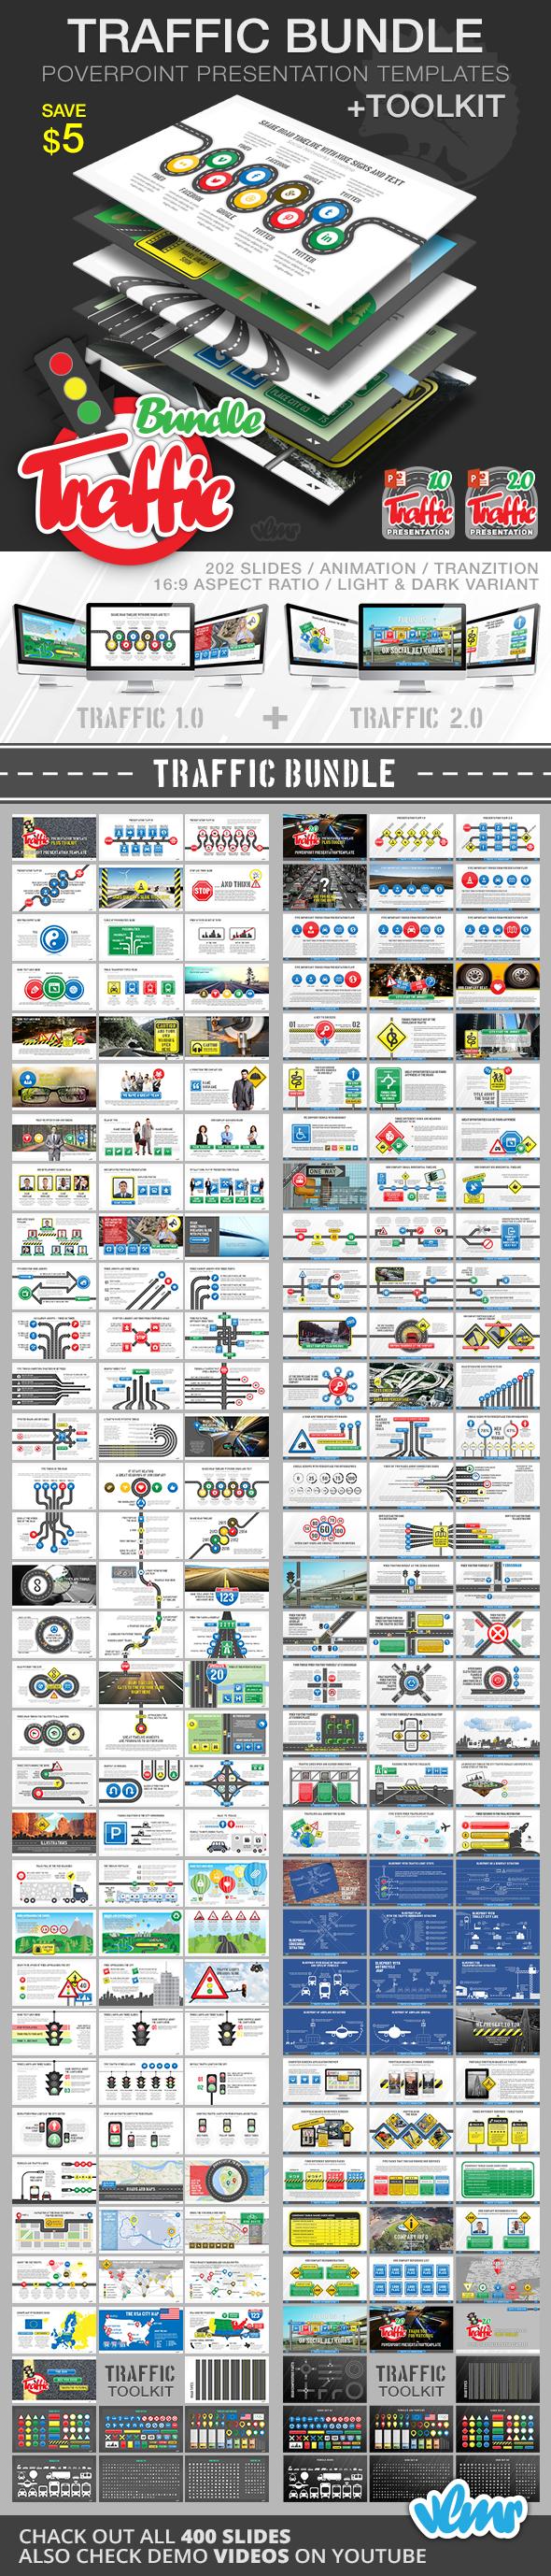 Transportation Presentation Templates From Graphicriver